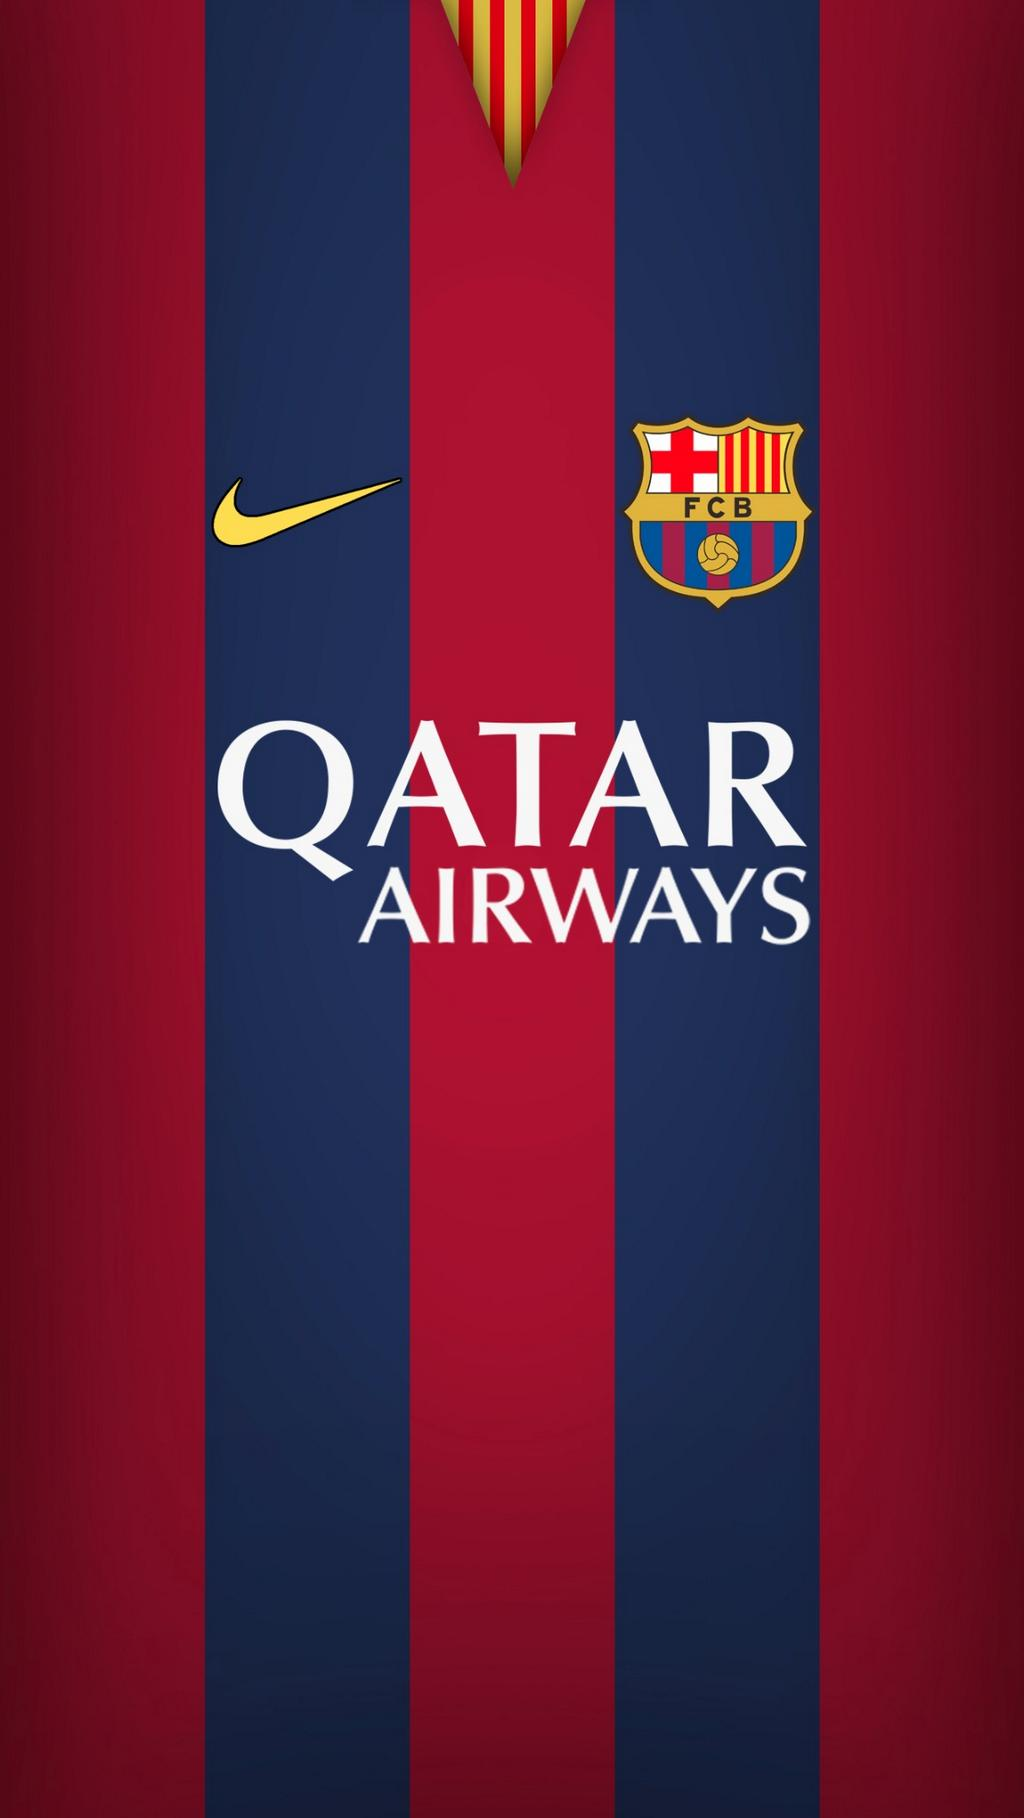 FC Barcelona - wallpaper.